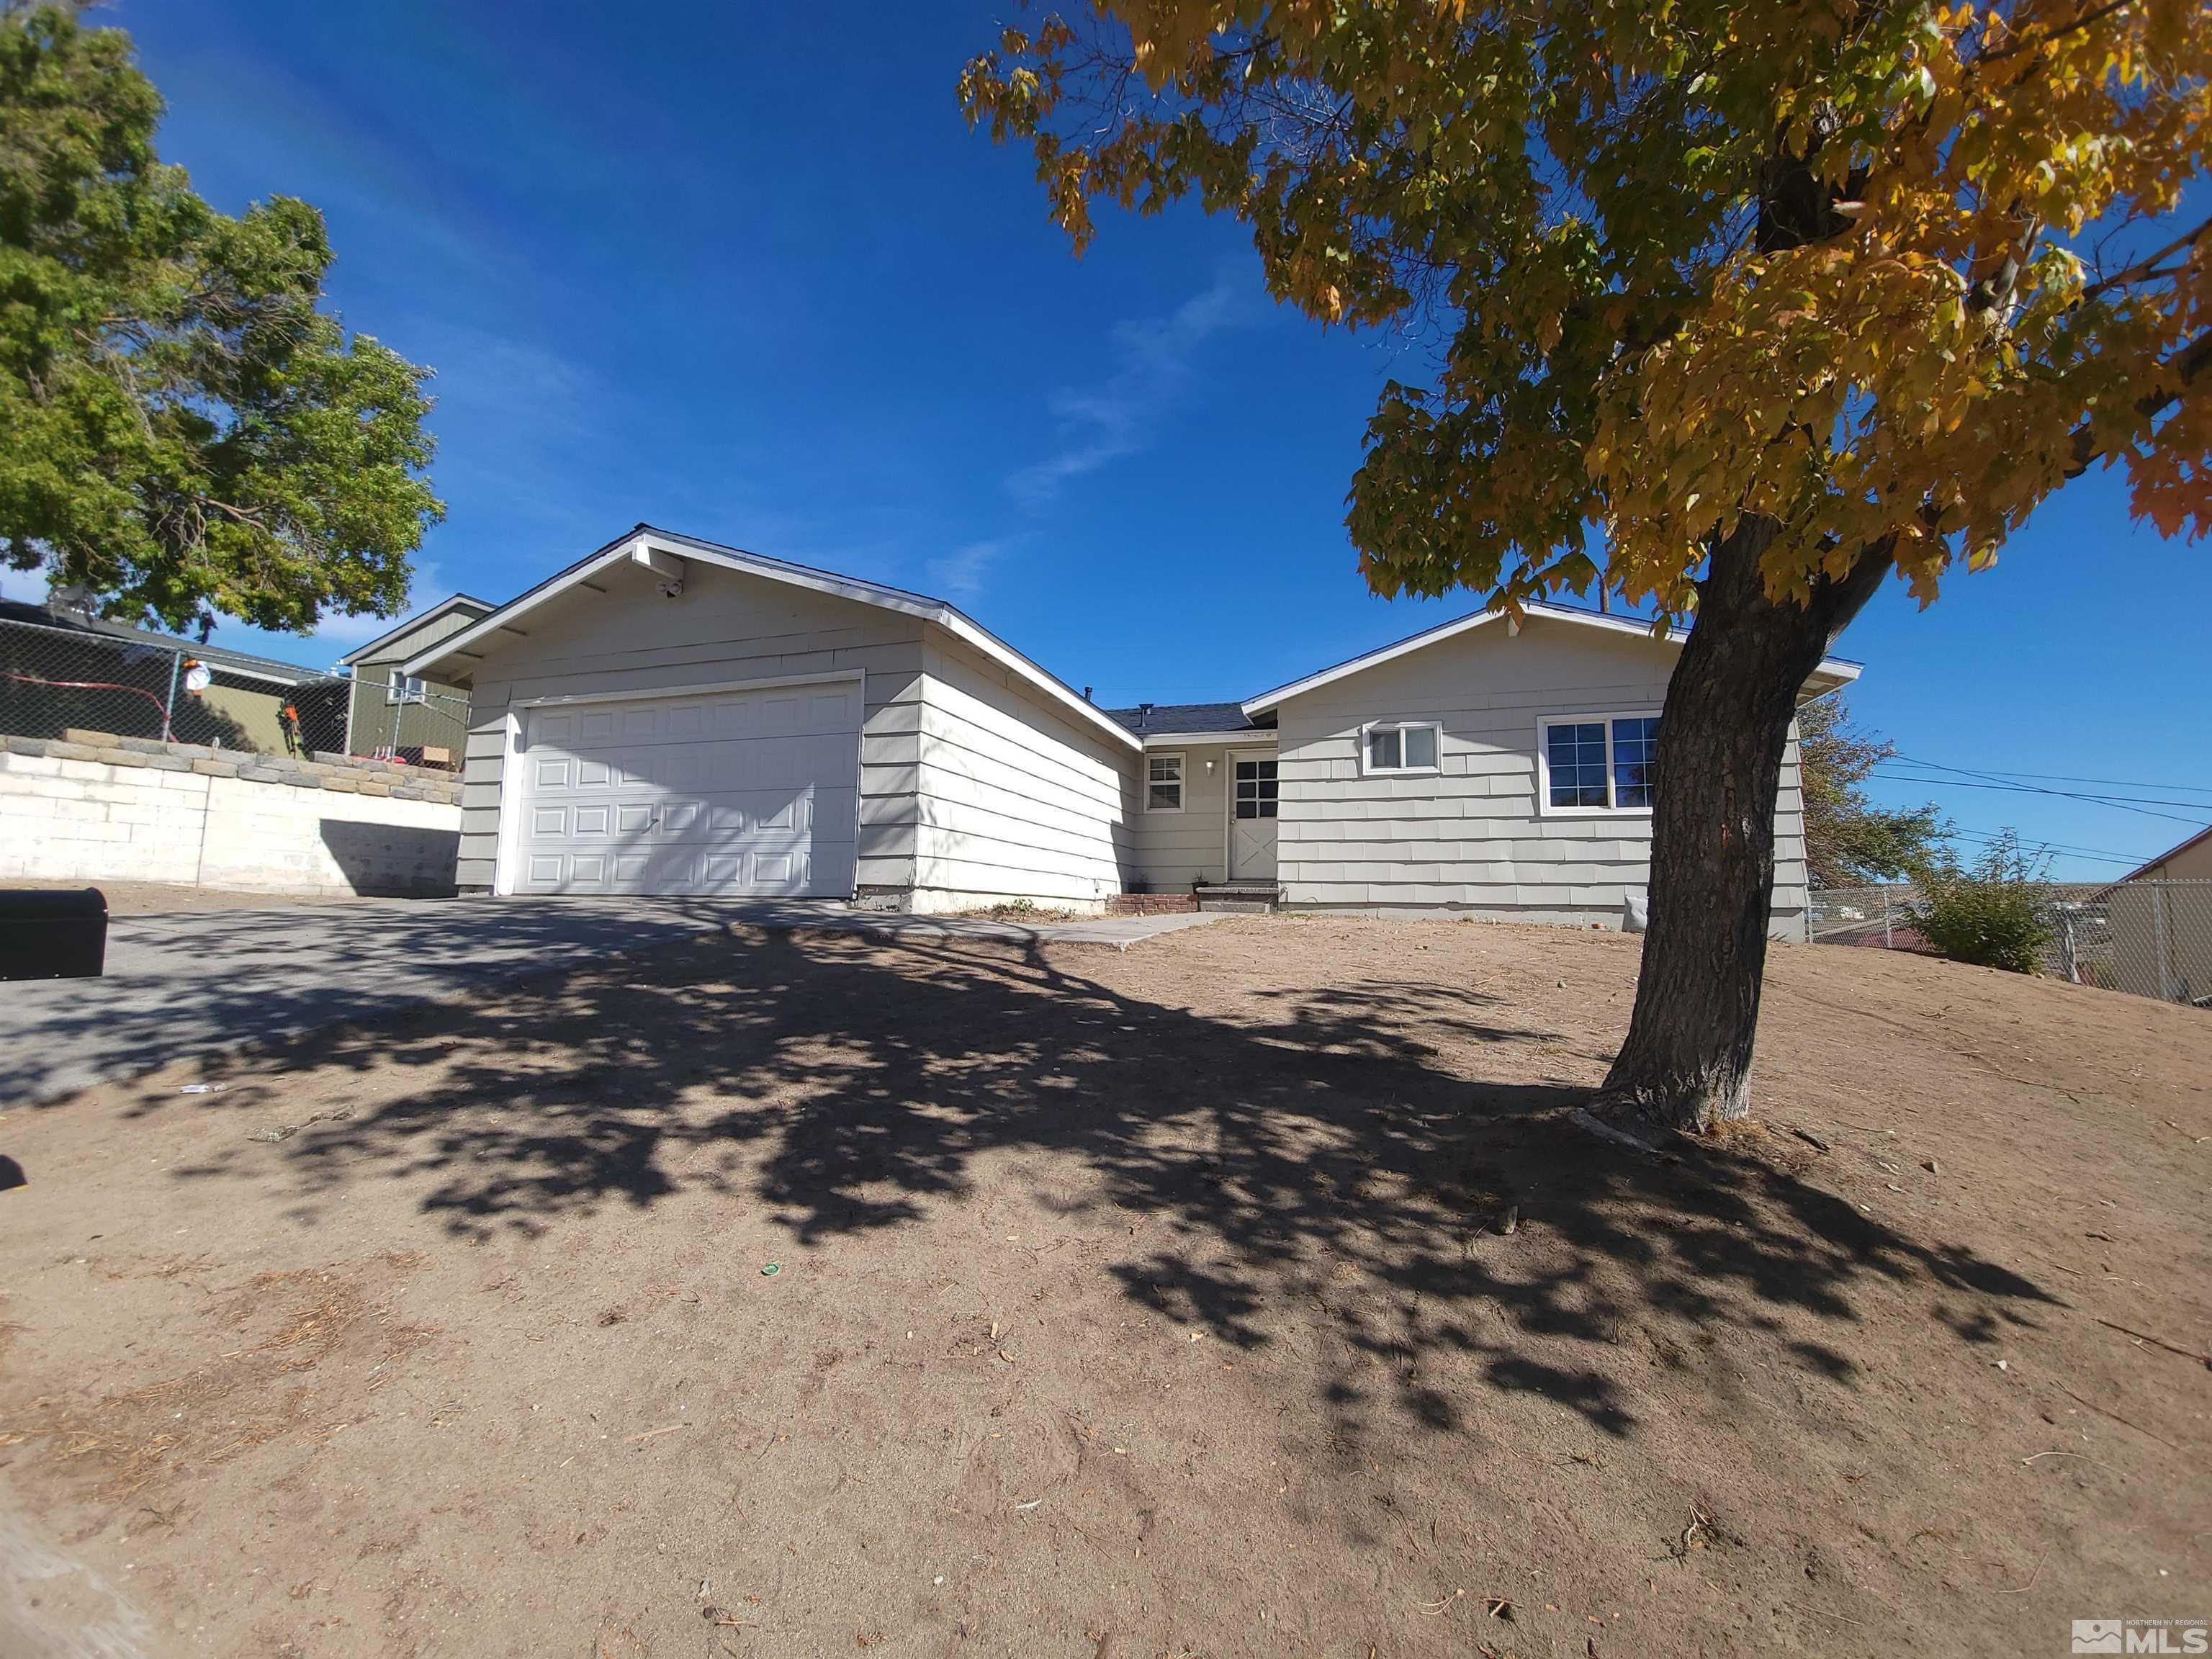 Image for 7530 Essex, Reno, NV 89506